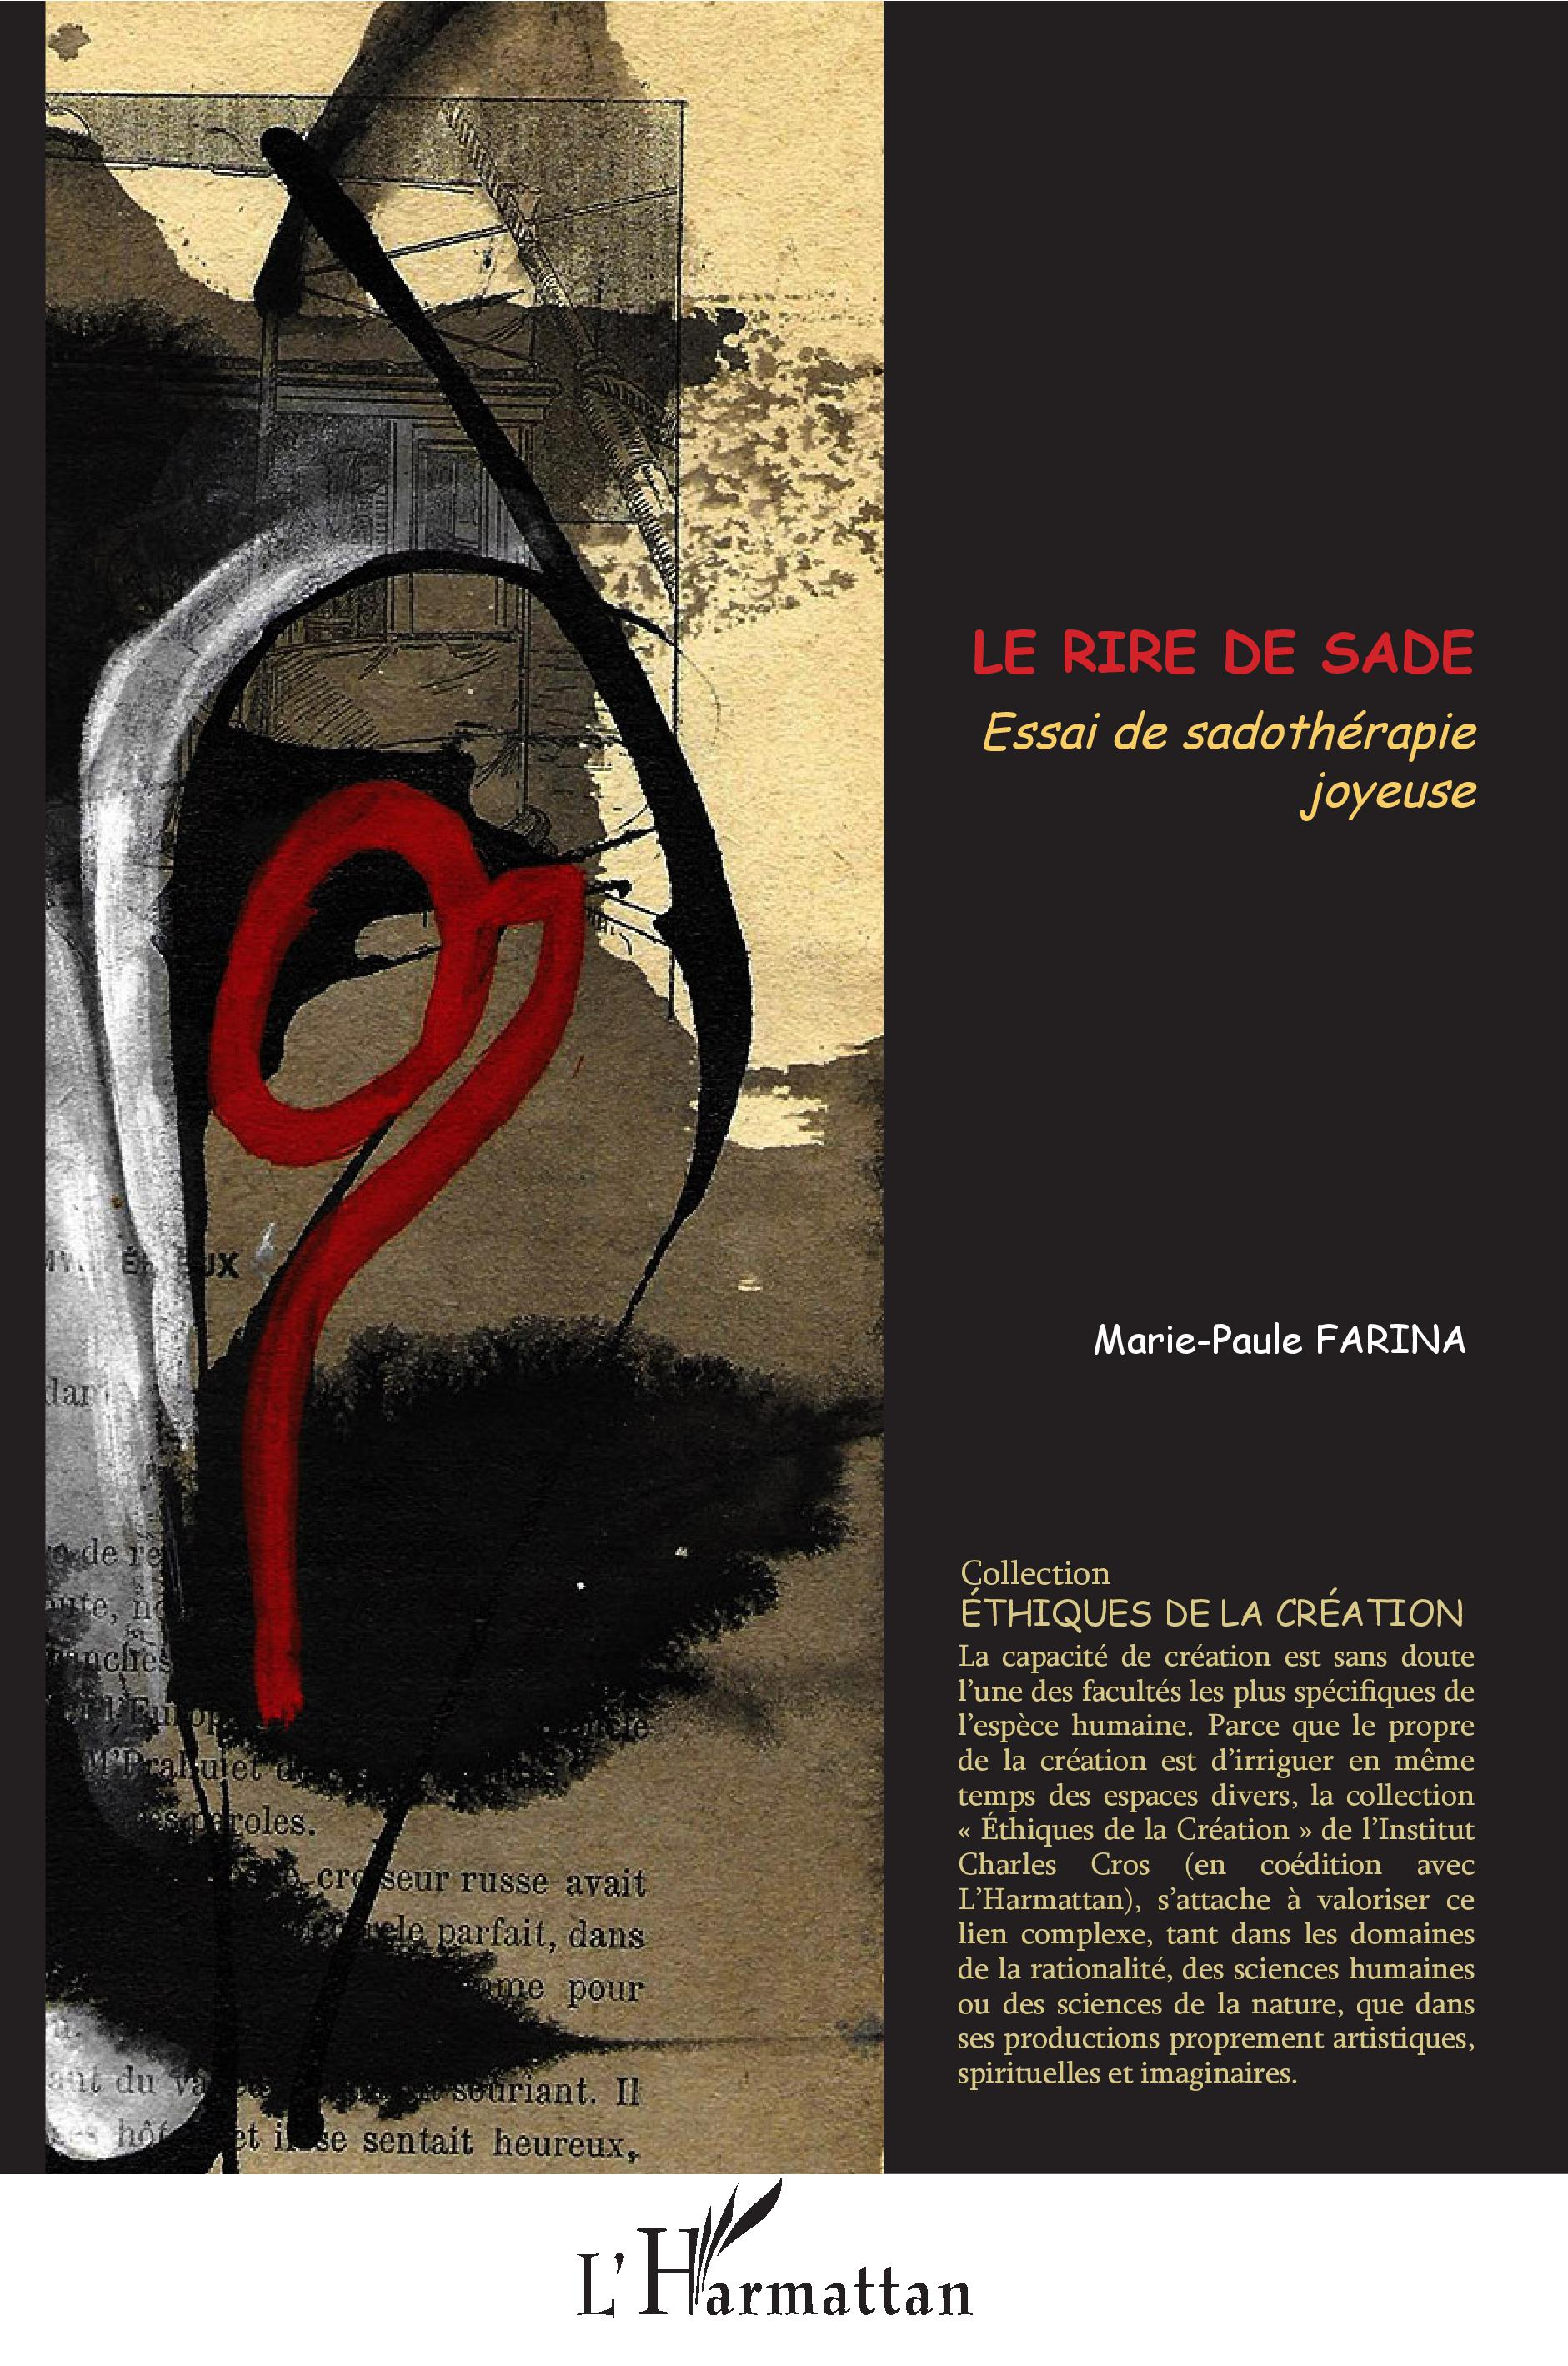 M.-P. Farina, Le rire de Sade, essai de sadothérapie joyeuse